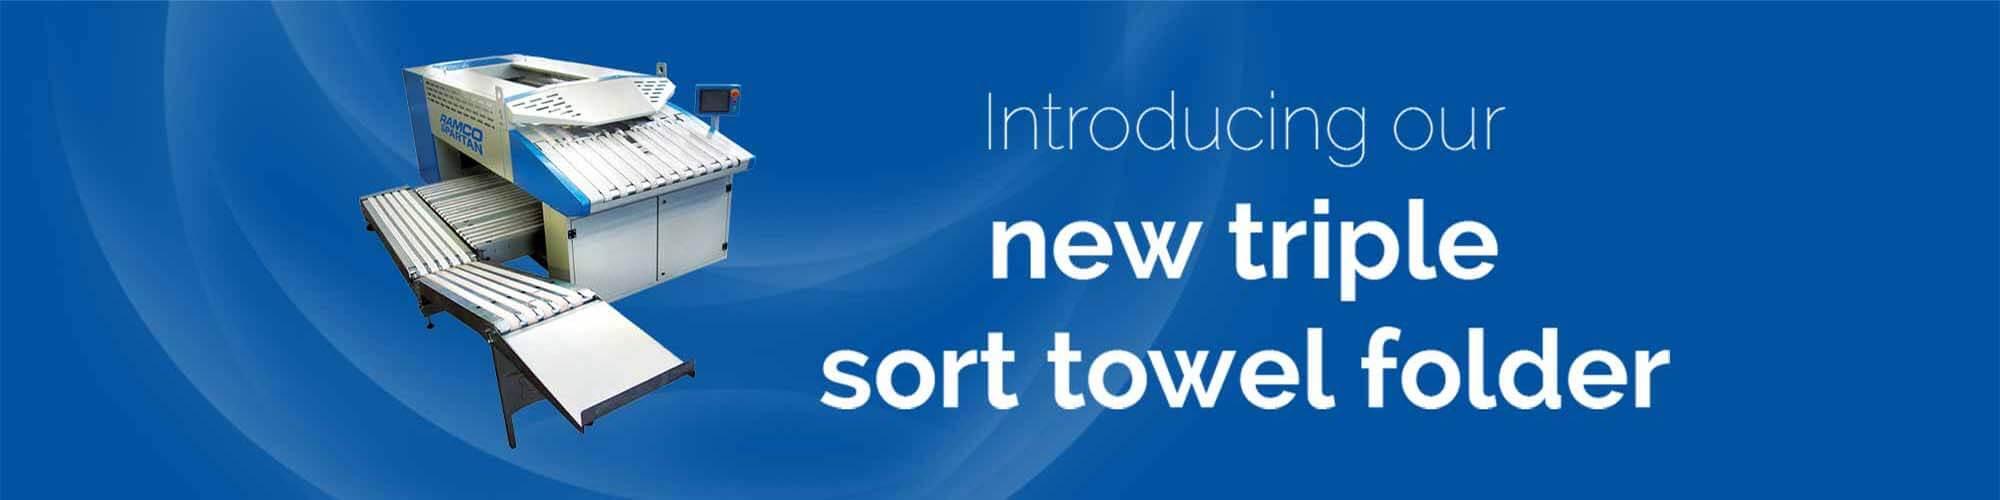 New triple sort towel folder